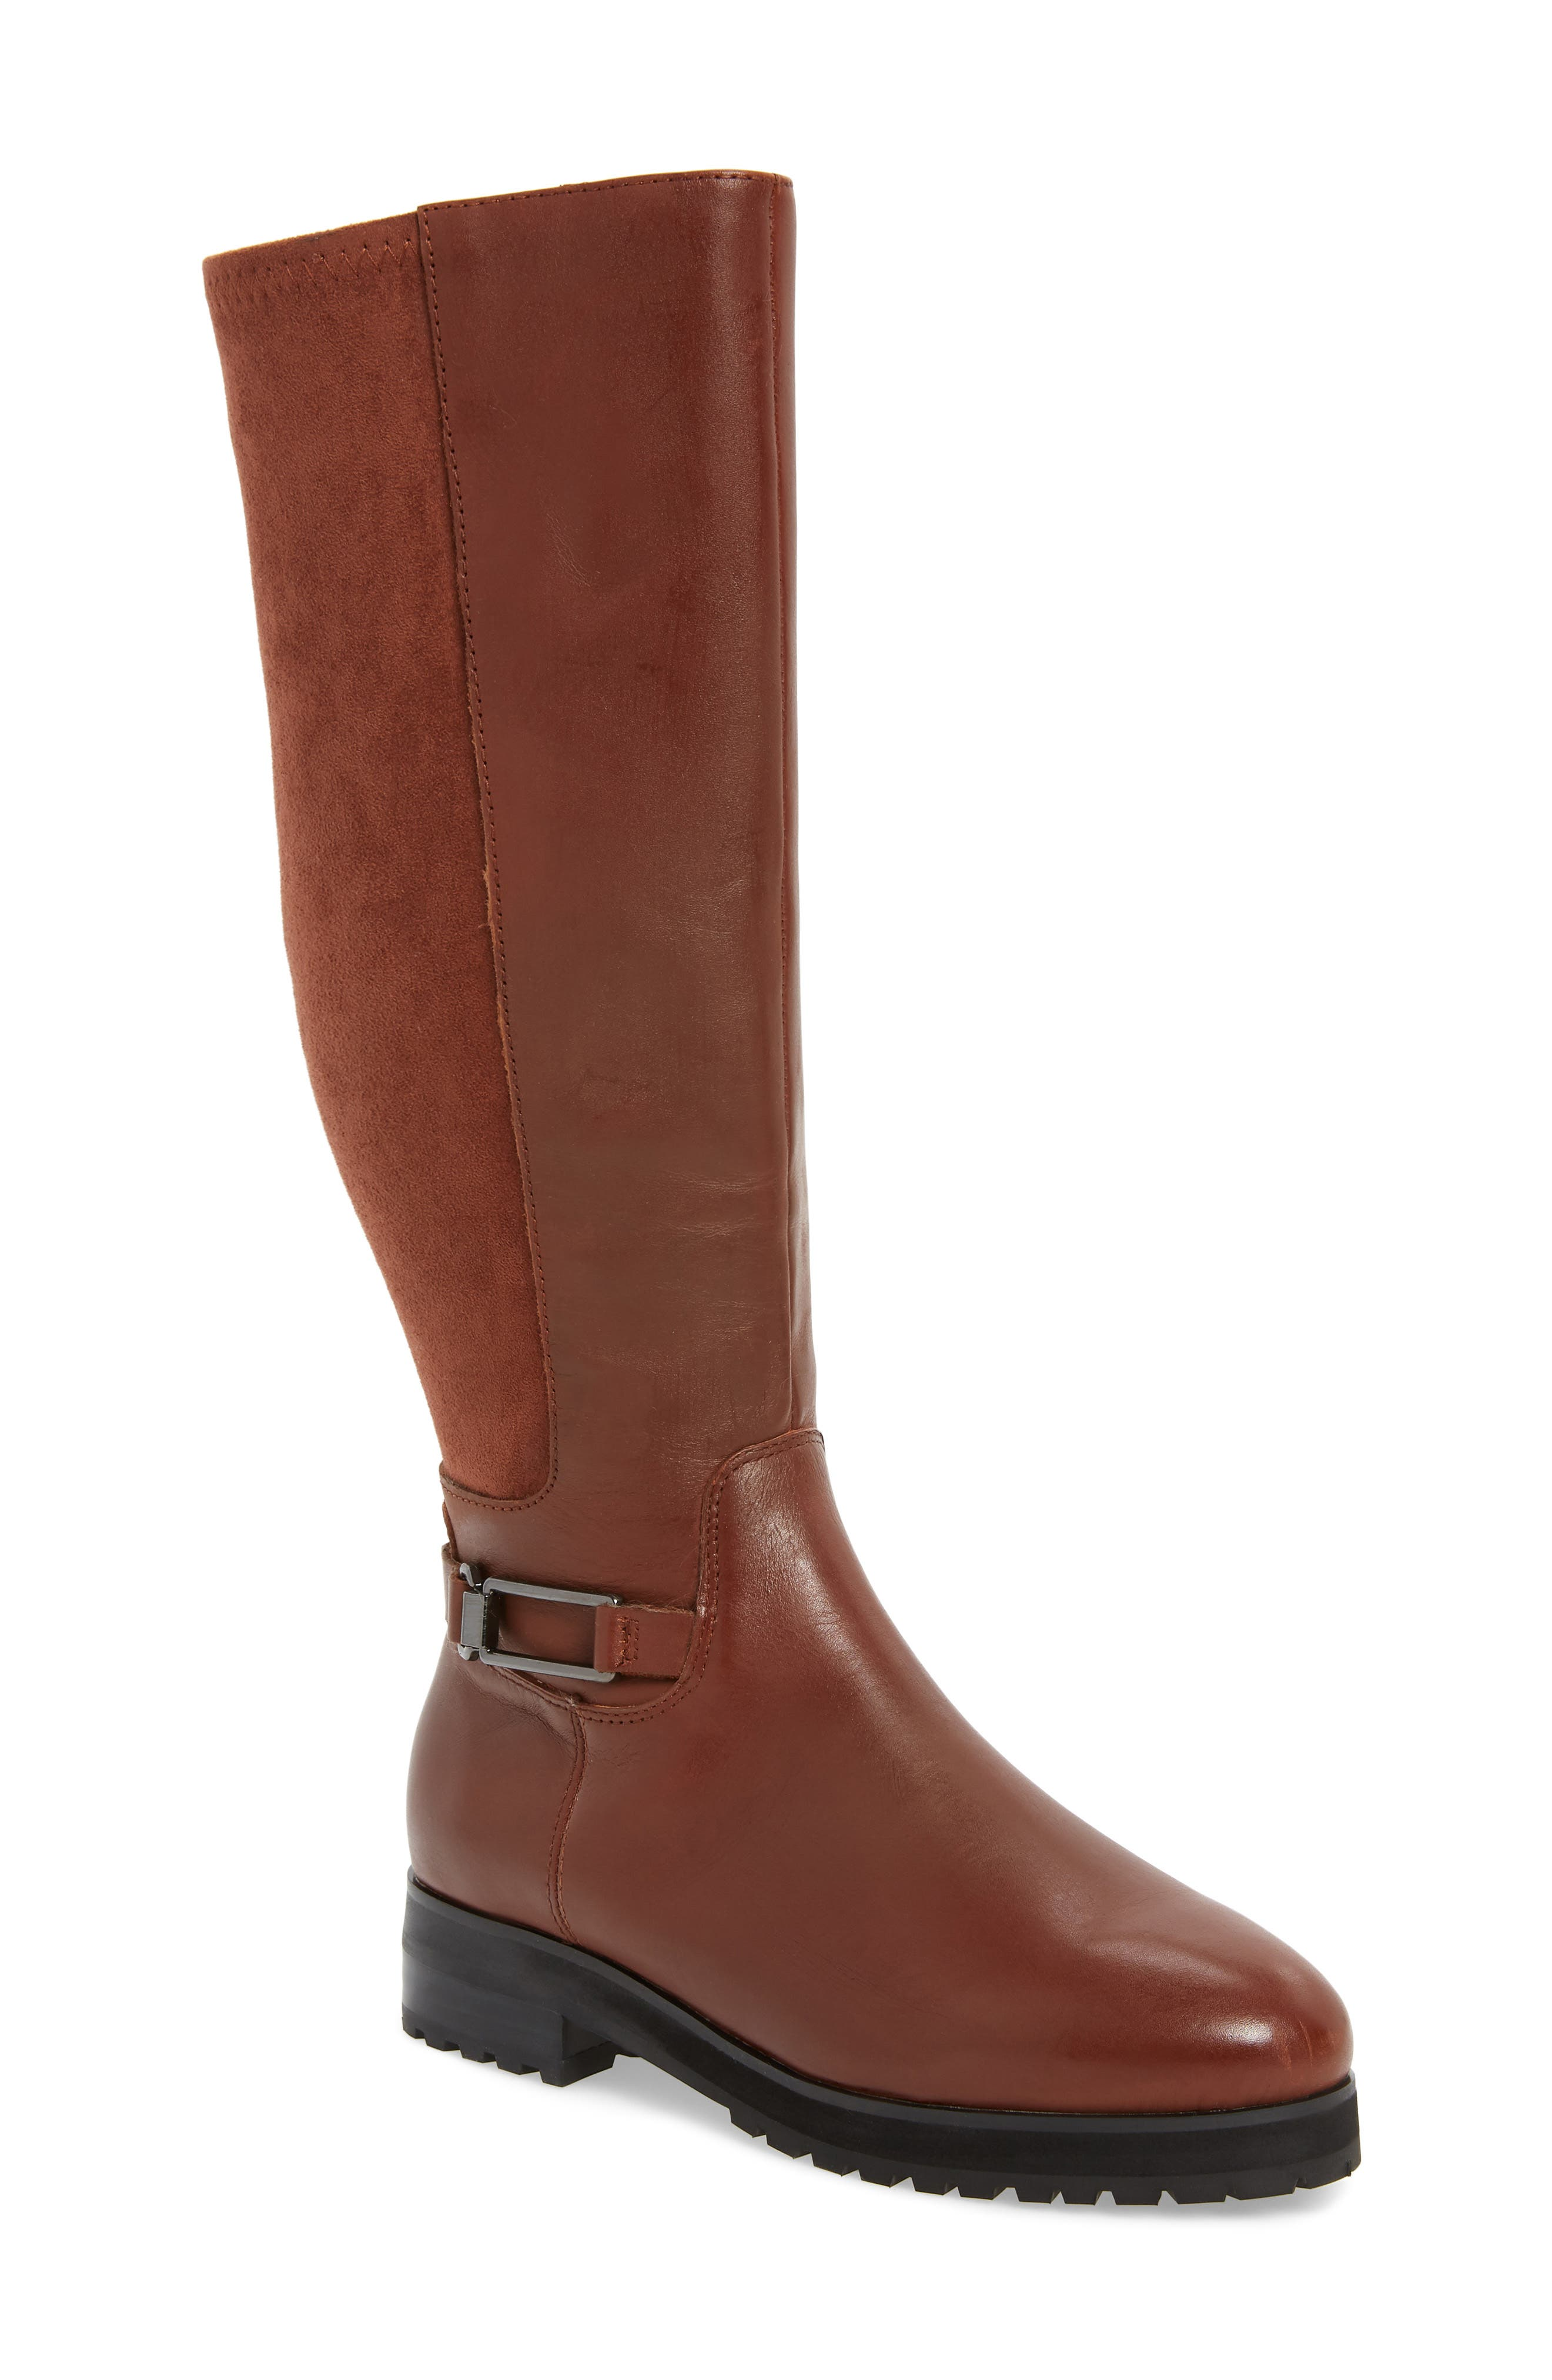 Frida Waterproof Knee High Boot,                             Main thumbnail 1, color,                             COGNAC